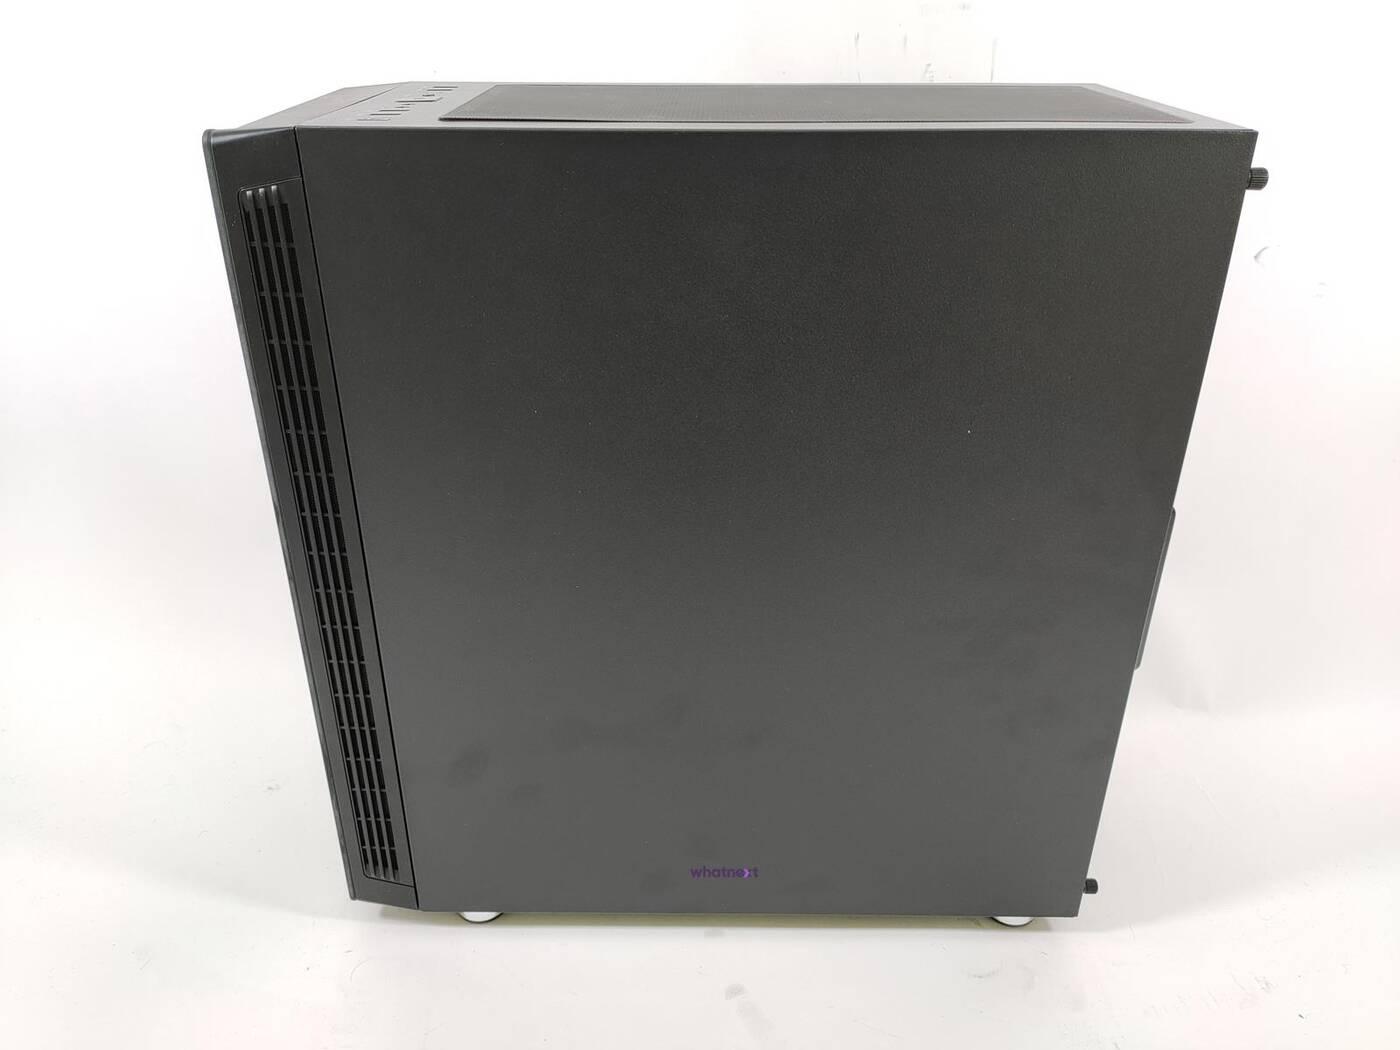 test Genesis Irid 400 RGB, recenzja Genesis Irid 400 RGB, review Genesis Irid 400 RGB, opinia Genesis Irid 400 RGB